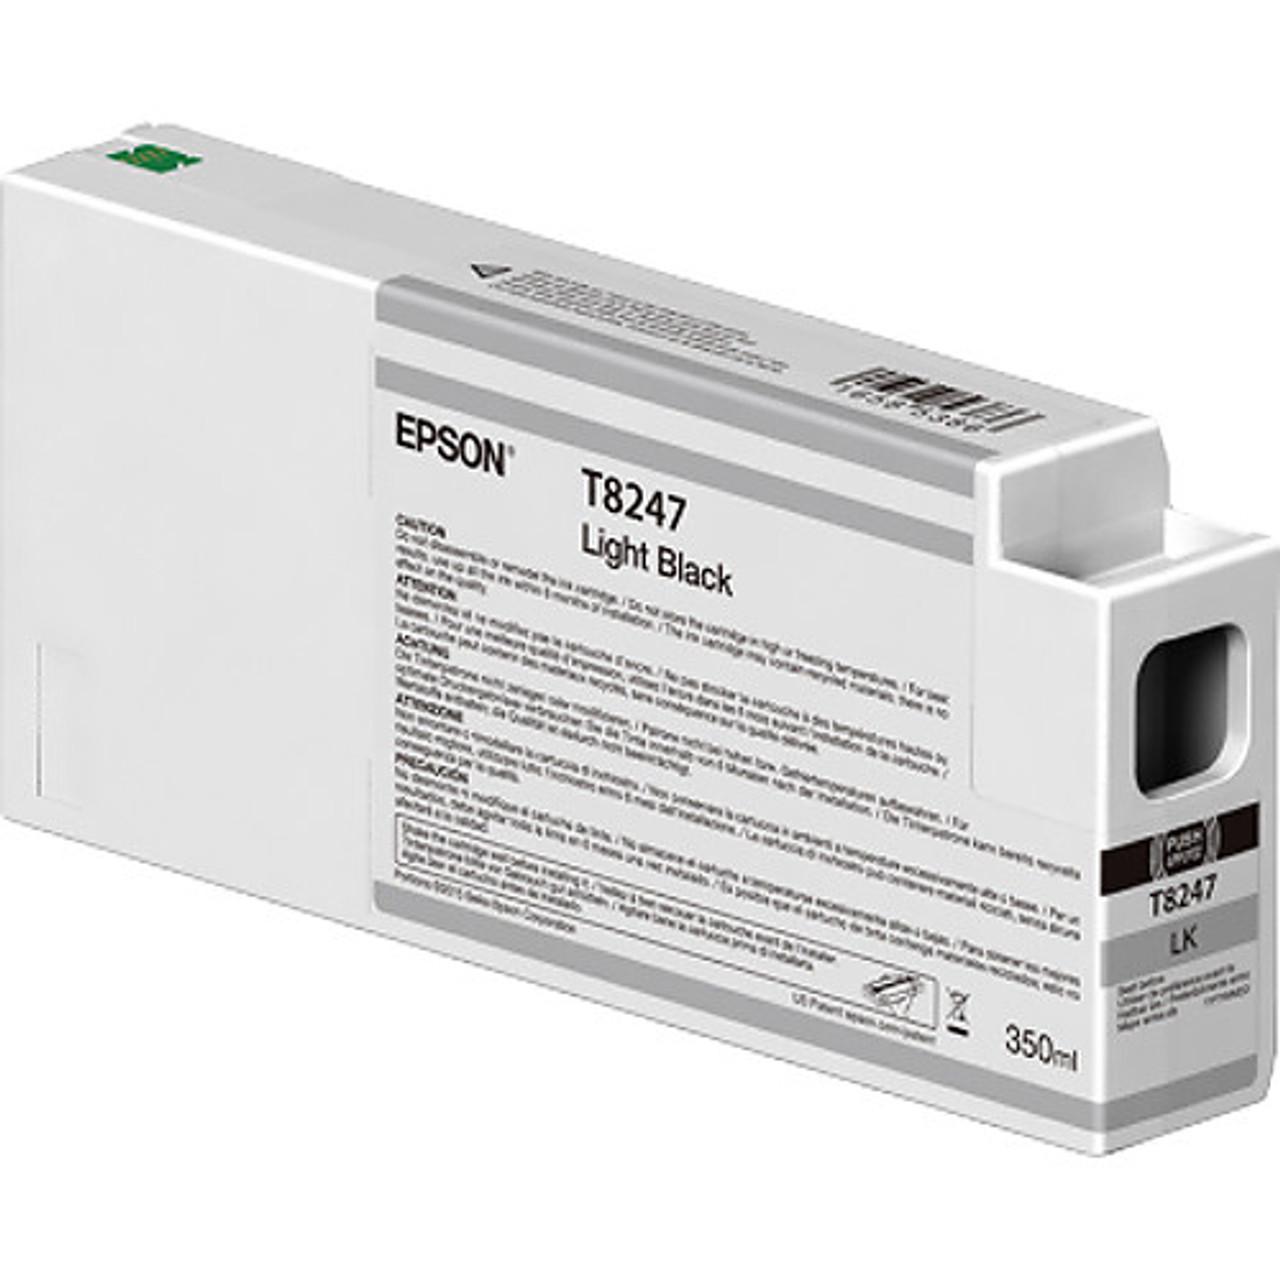 Epson T824700 Light Black Ink Cartridge, 350 mL